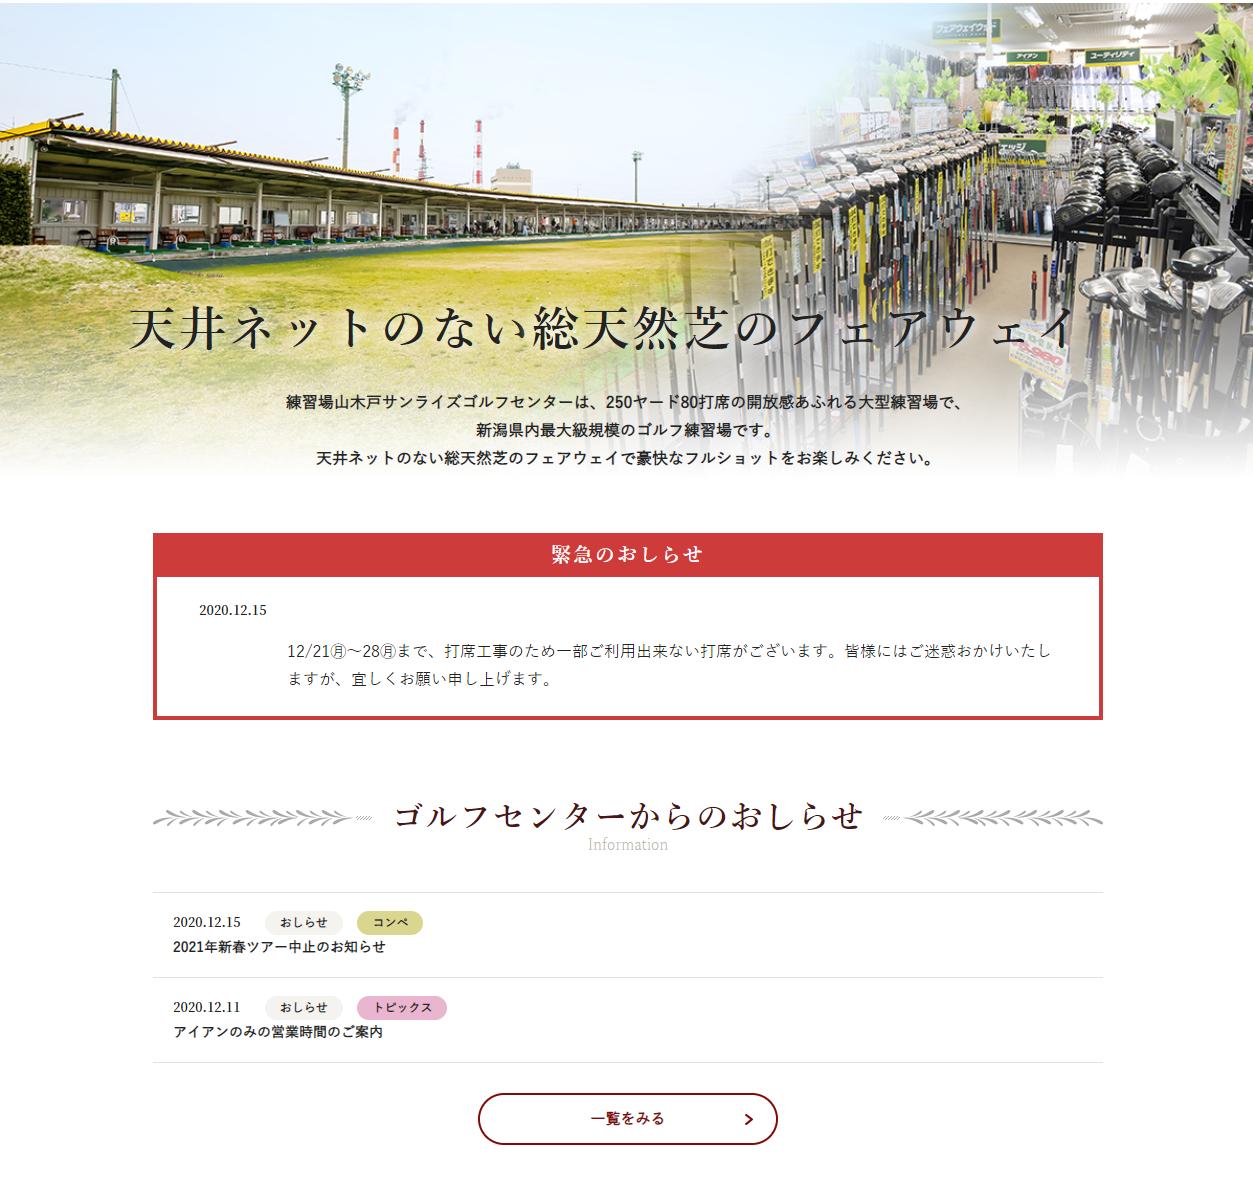 "<span class=""title"">山木戸サンライズゴルフセンターの口コミや評判</span>"